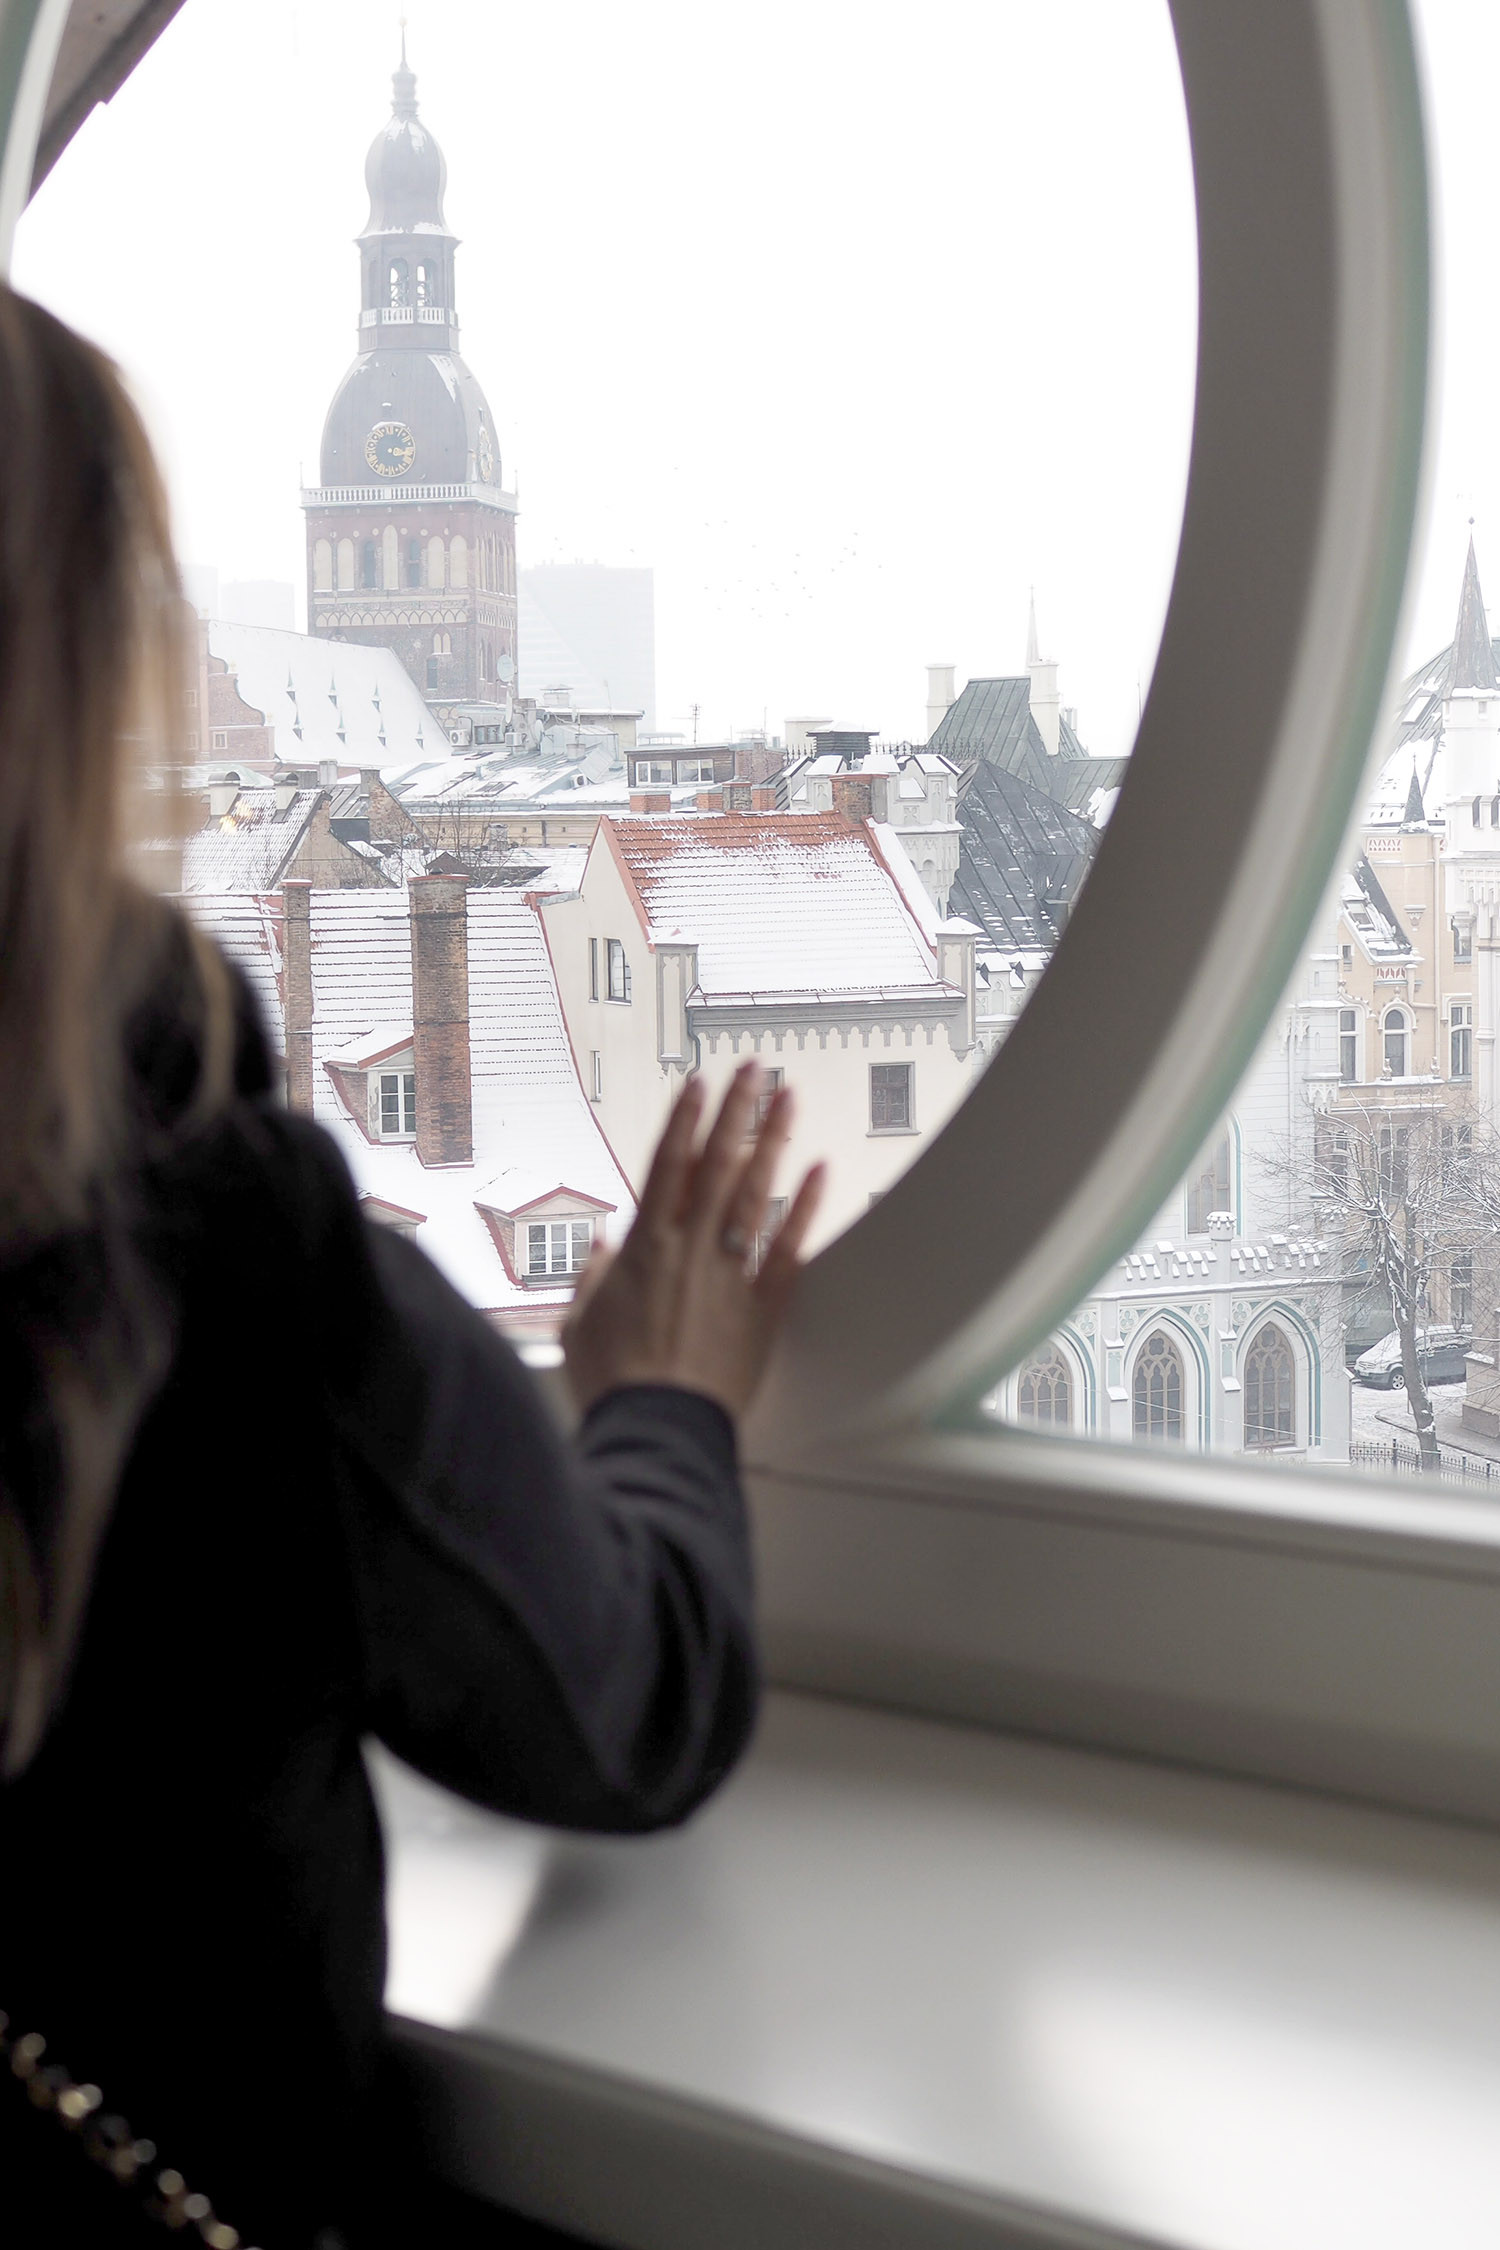 Char and the city, matkaopas Riikaan, travelguide to Riga, ravintolat, hotellit, hemmottelu, shoppailu